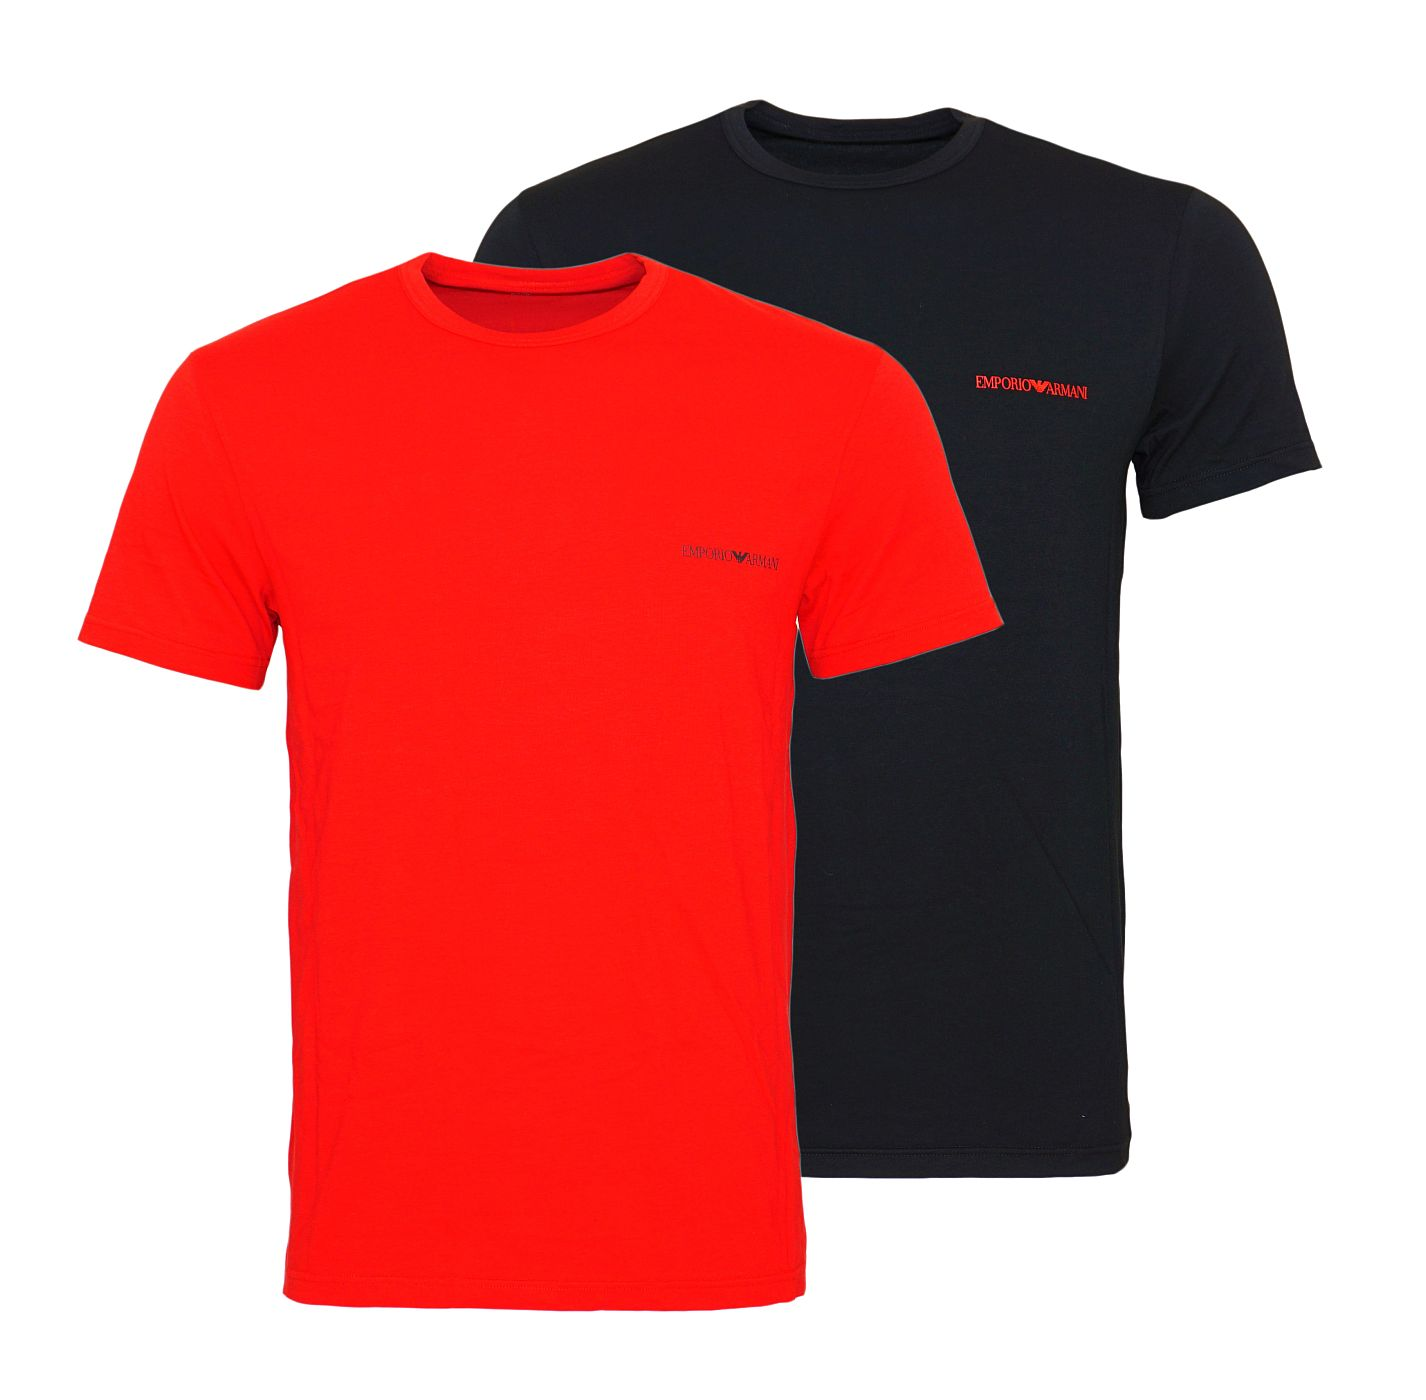 Emporio Armani 2er Pack T-Shirts Rundhals 111267 8A717 02520 NERO/RUBINO SH18-EAT1